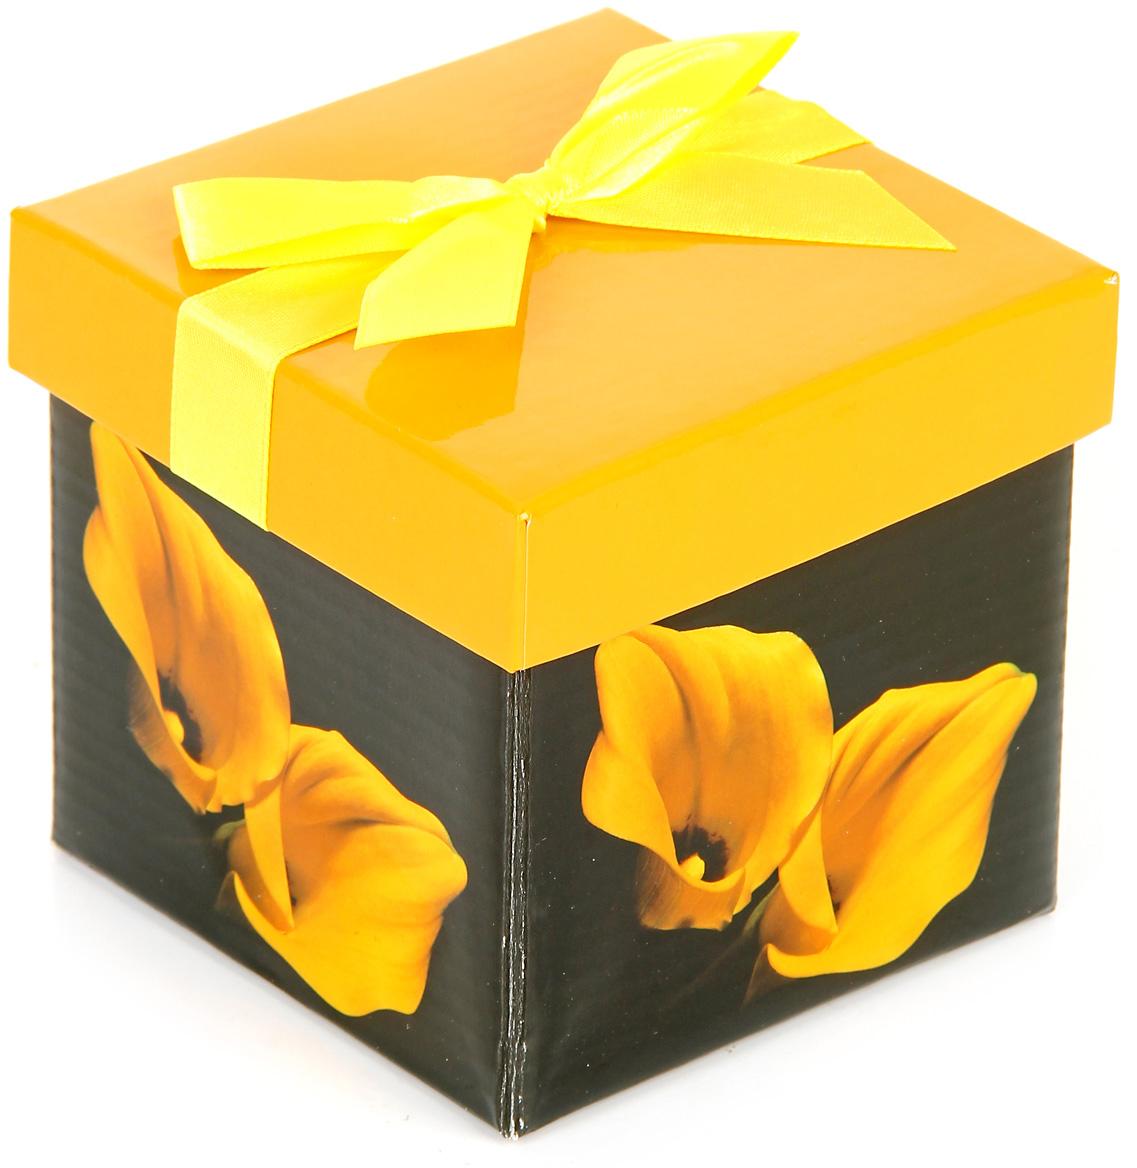 Коробка подарочная Veld-Co Giftbox. Трансформер. Яркость, цвет: черный, 10,3 х 10,3 х 9,8 см коробка подарочная veld co свадебный бабочки цвет слоновая кость 18 х 18 х 26 см